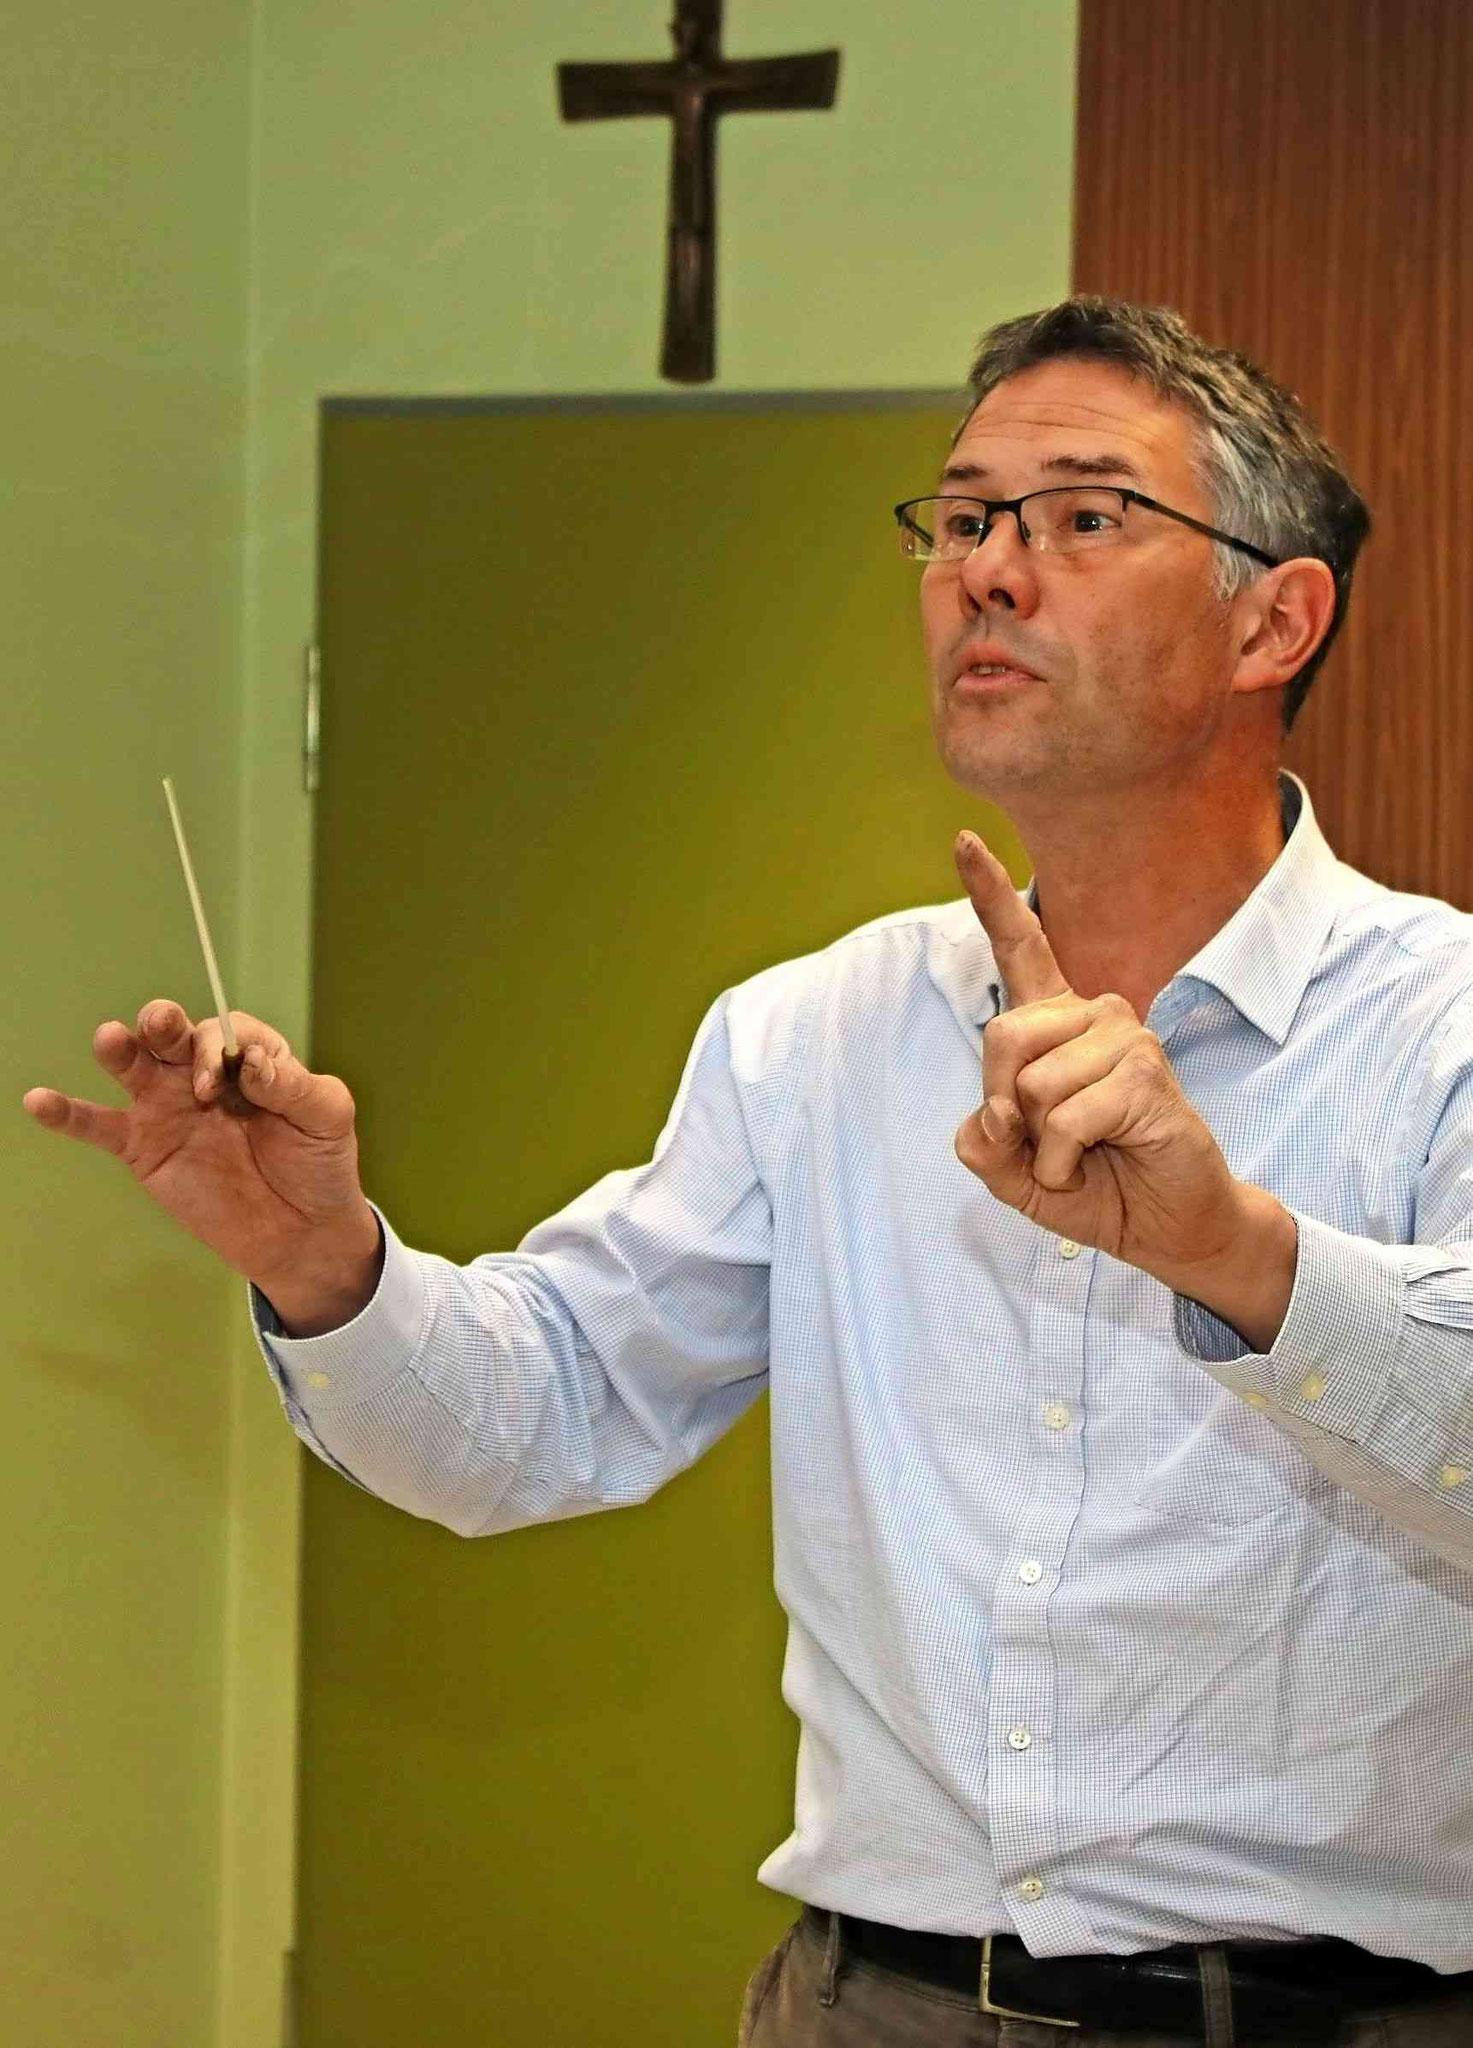 Jürgen Kullmann dirigiert. Foto: Christoph Strouvelle